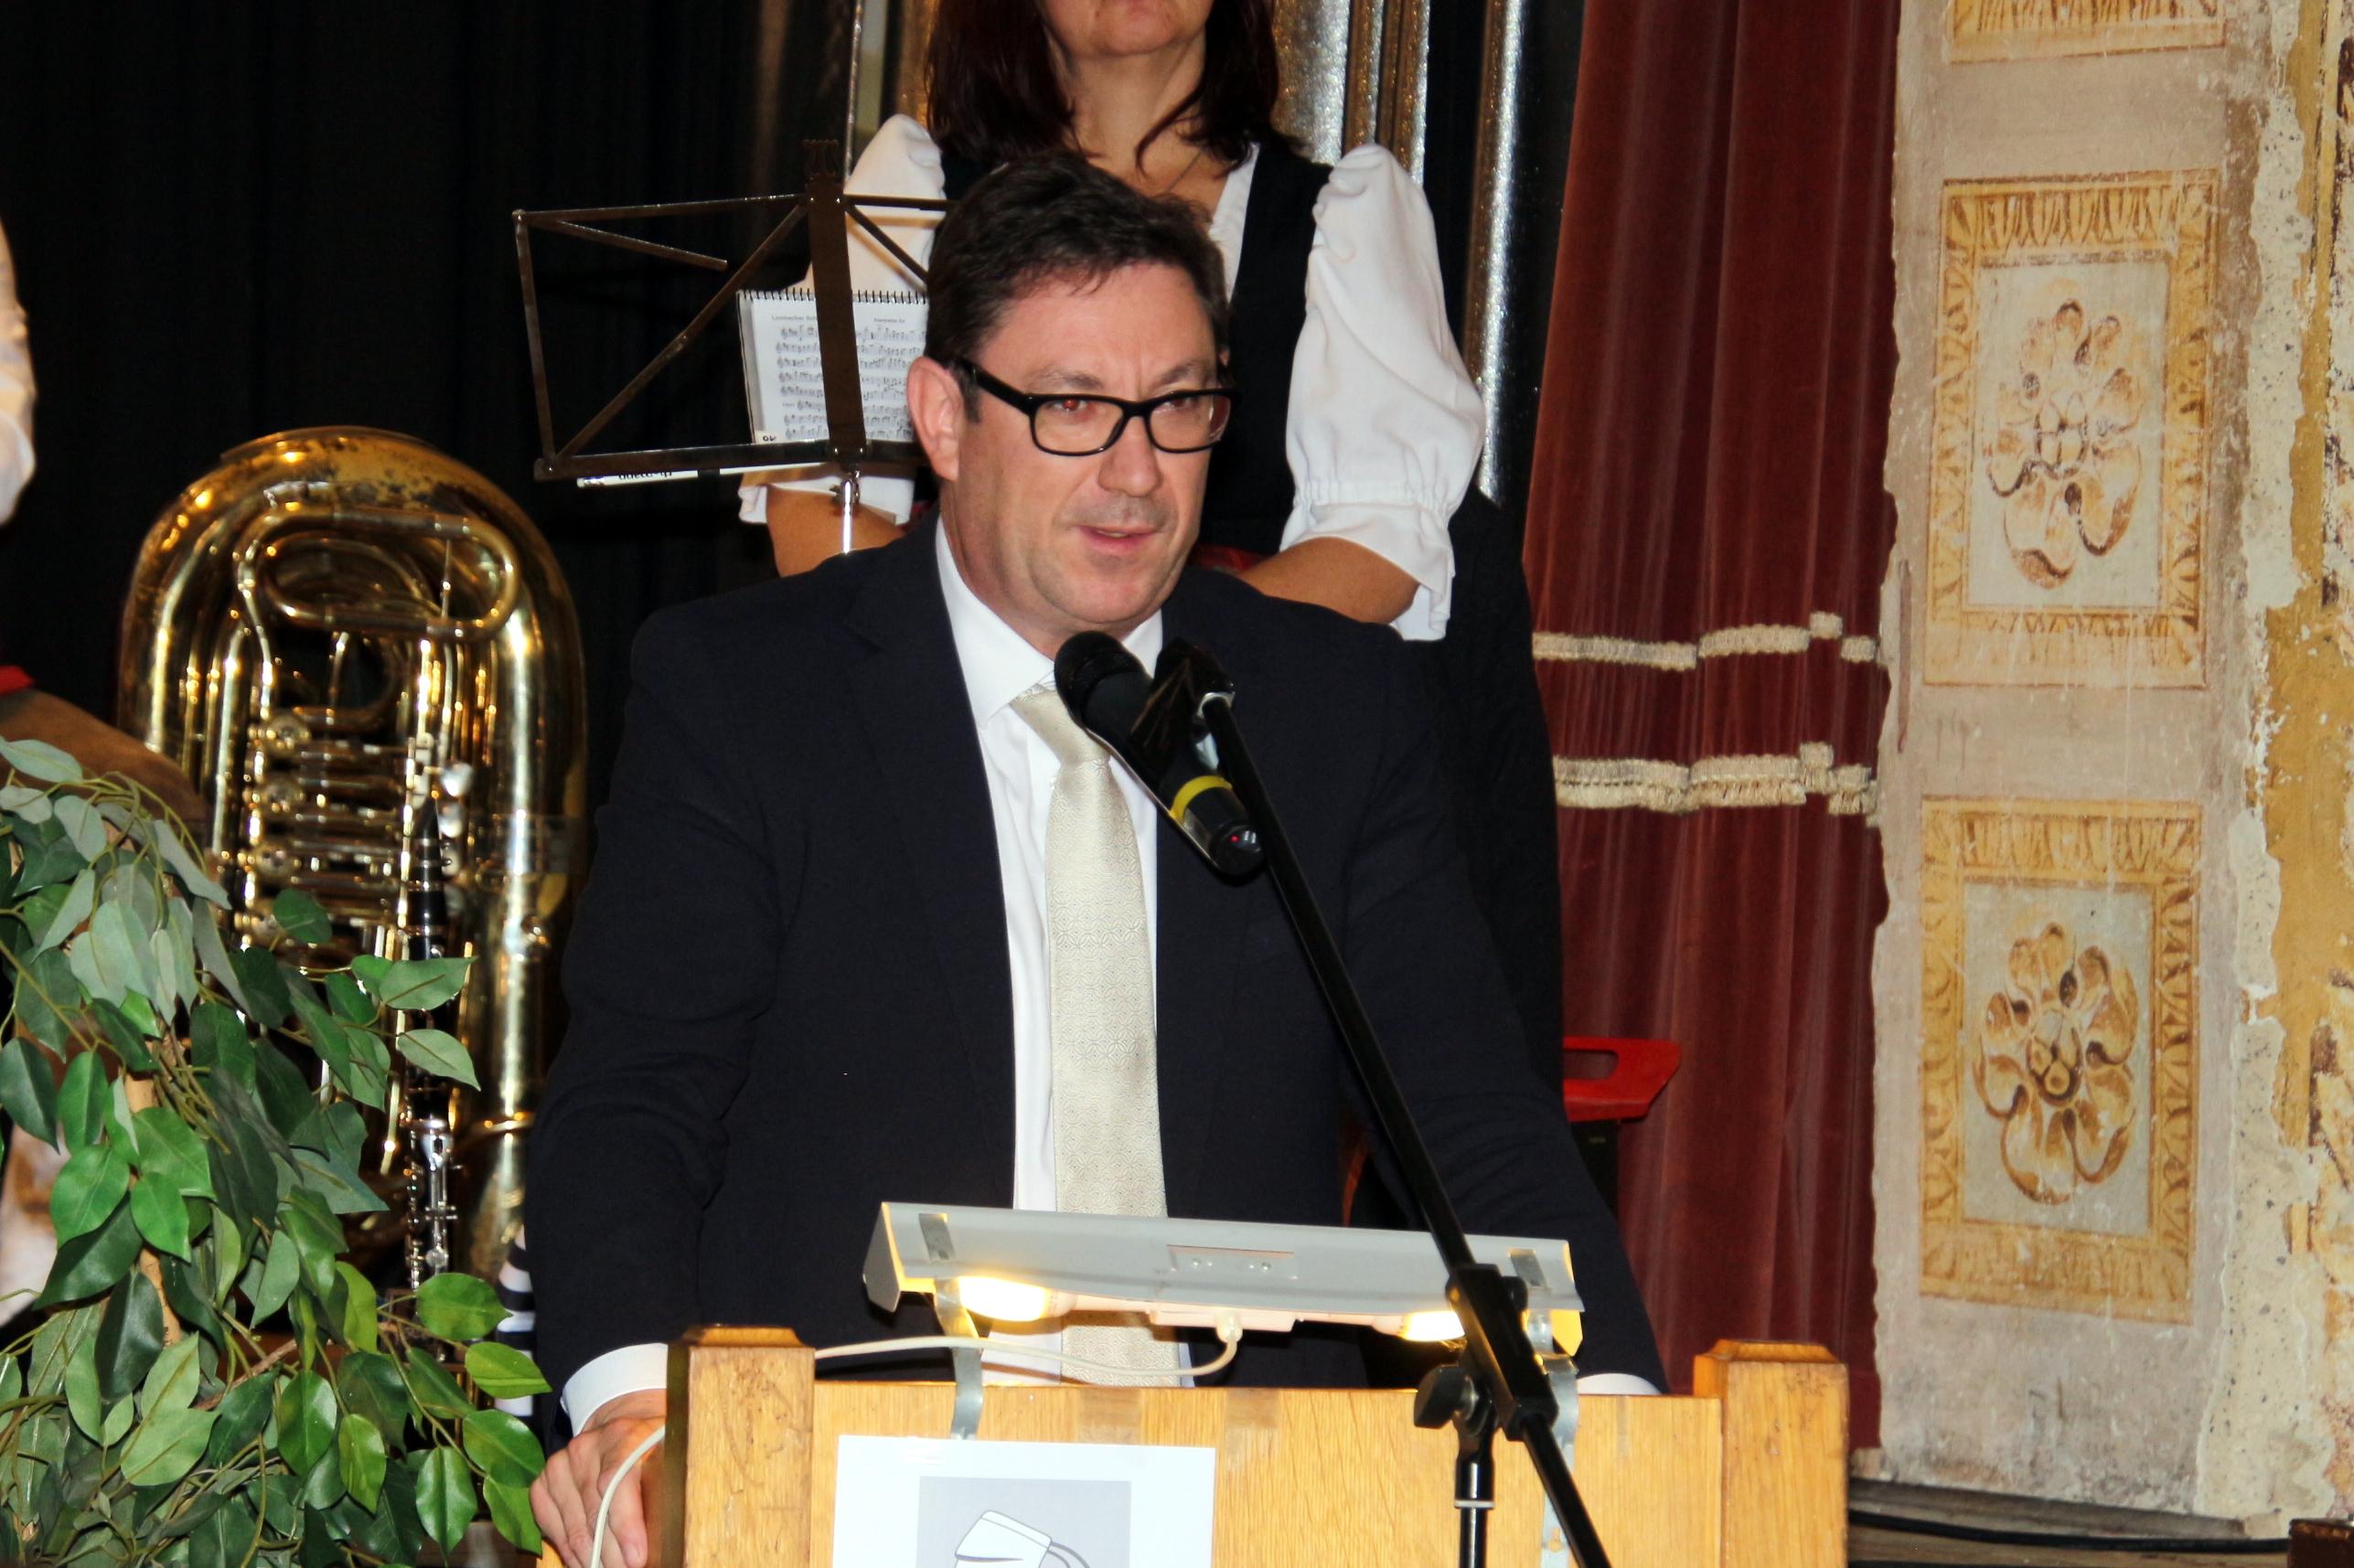 2020-10-13 Isen Altbürgermeister (65)